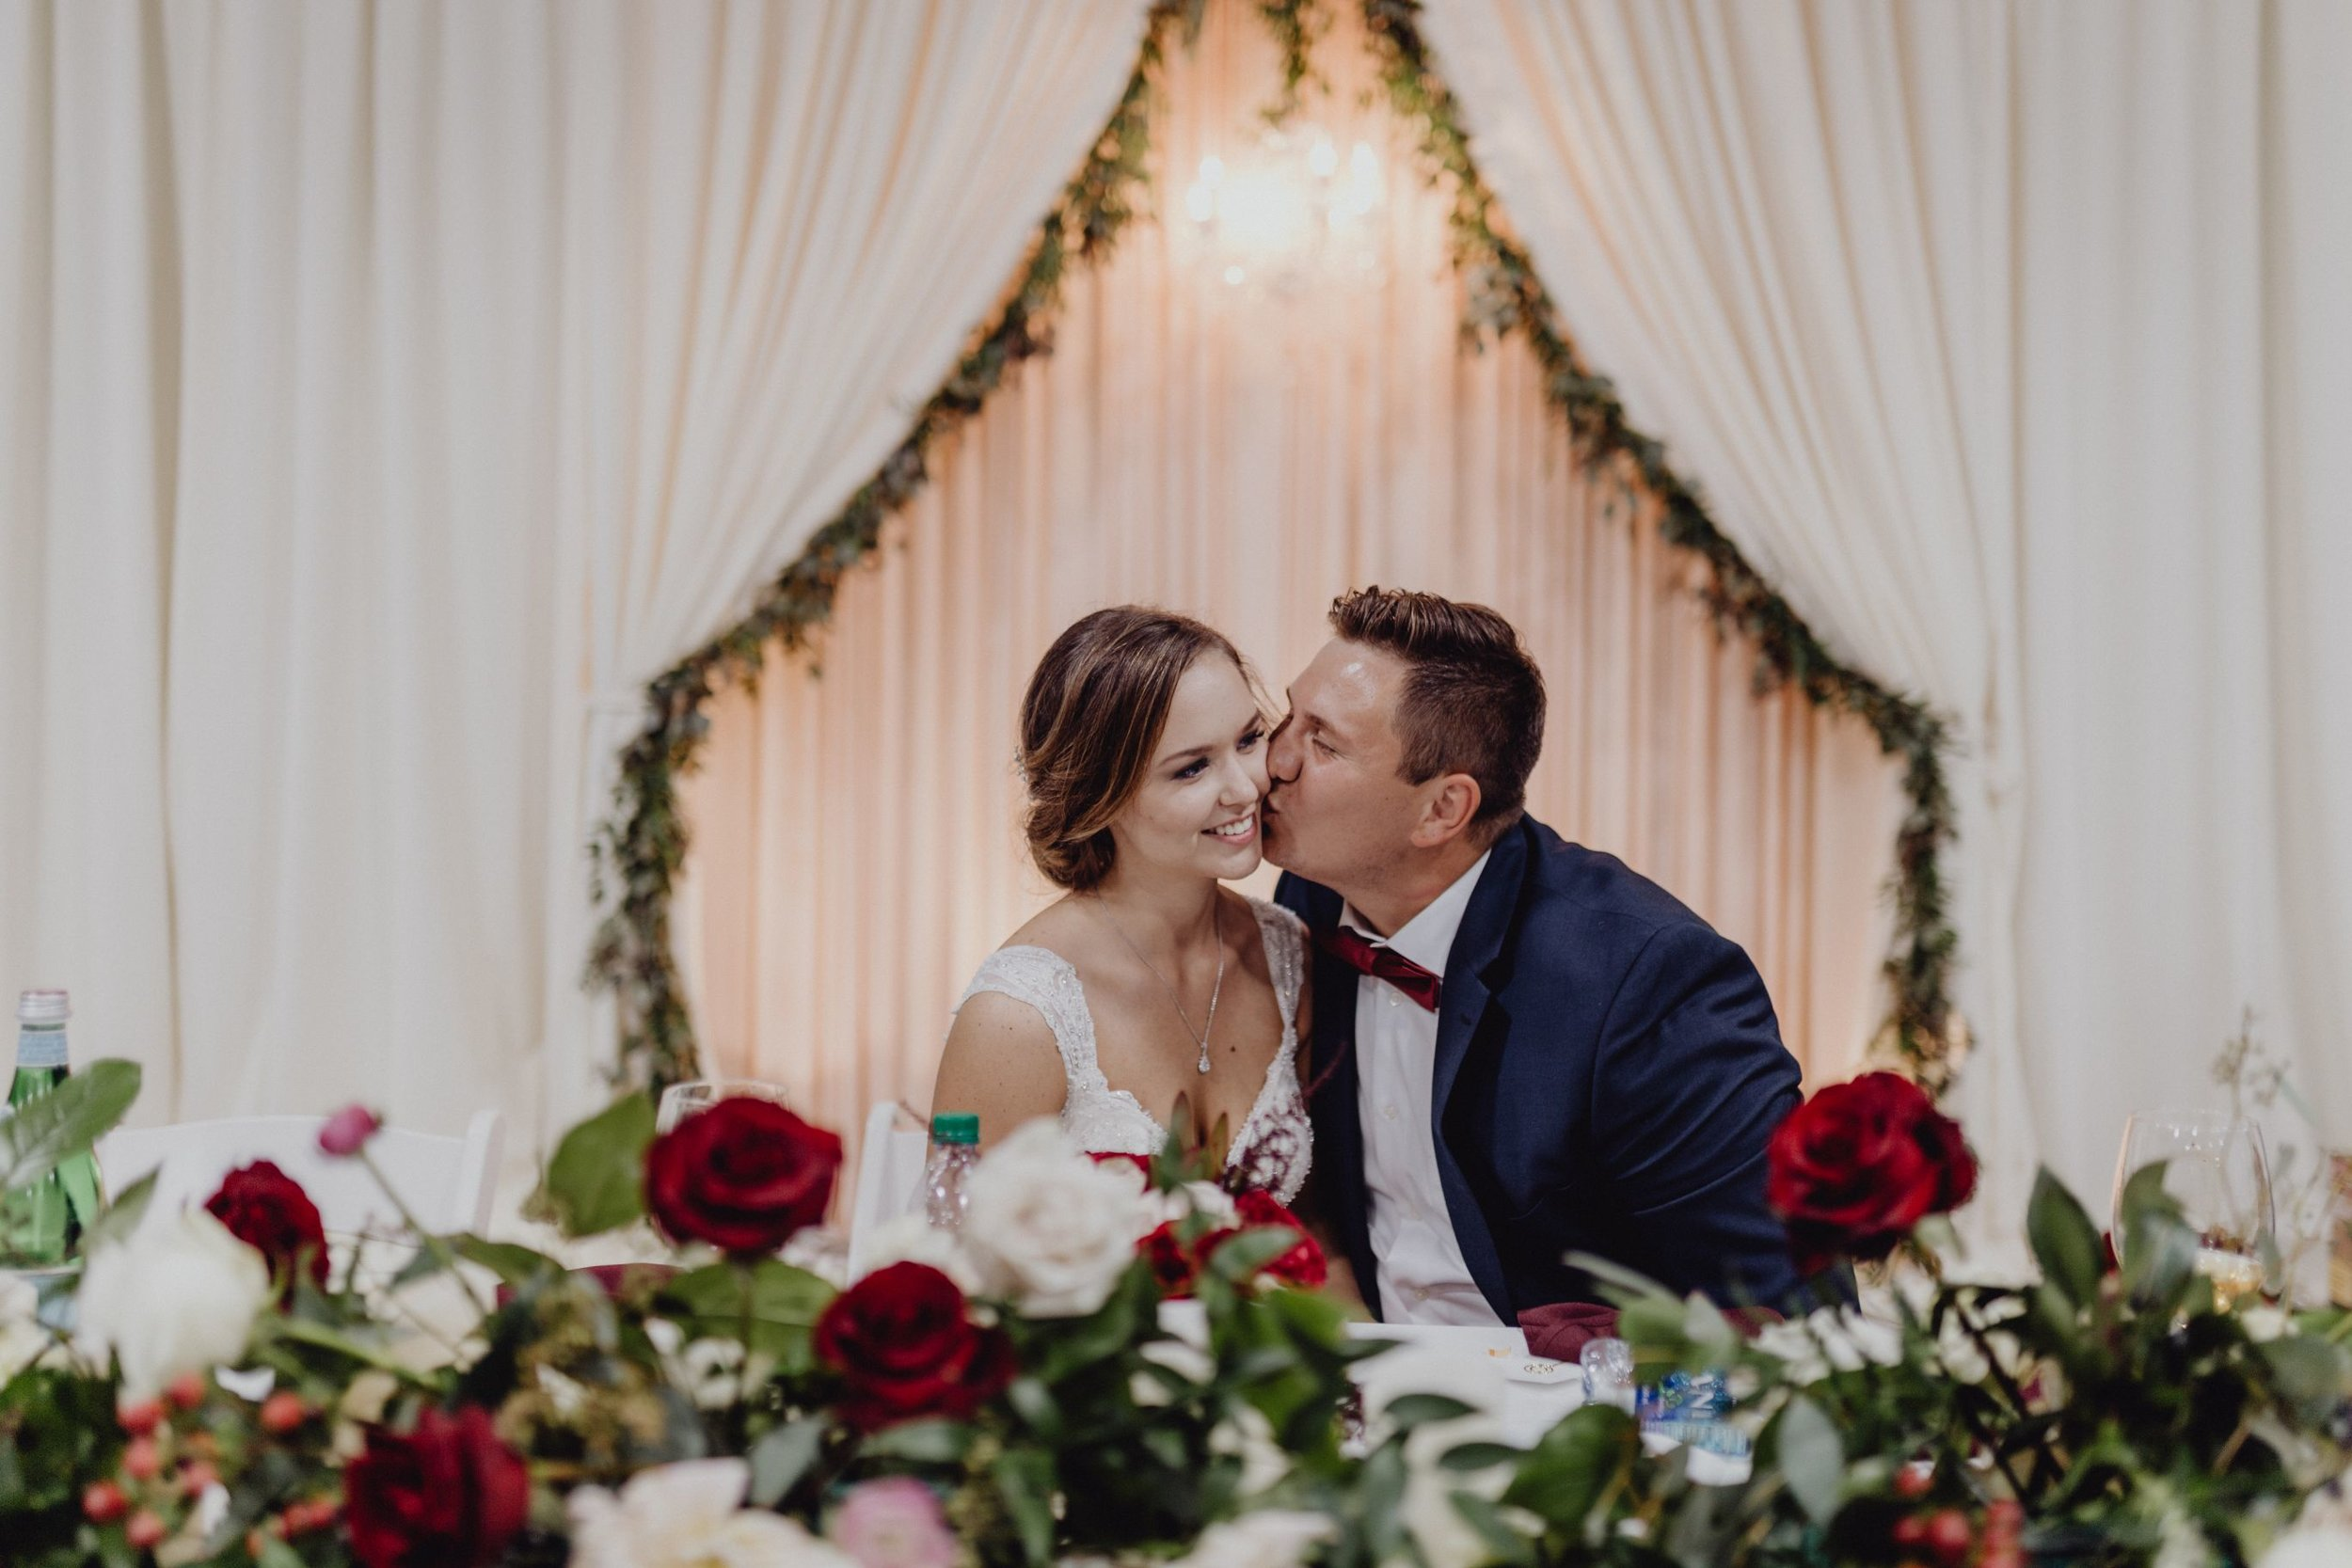 North-Dallas-Wedding-Florist-David-Co.-17.jpg